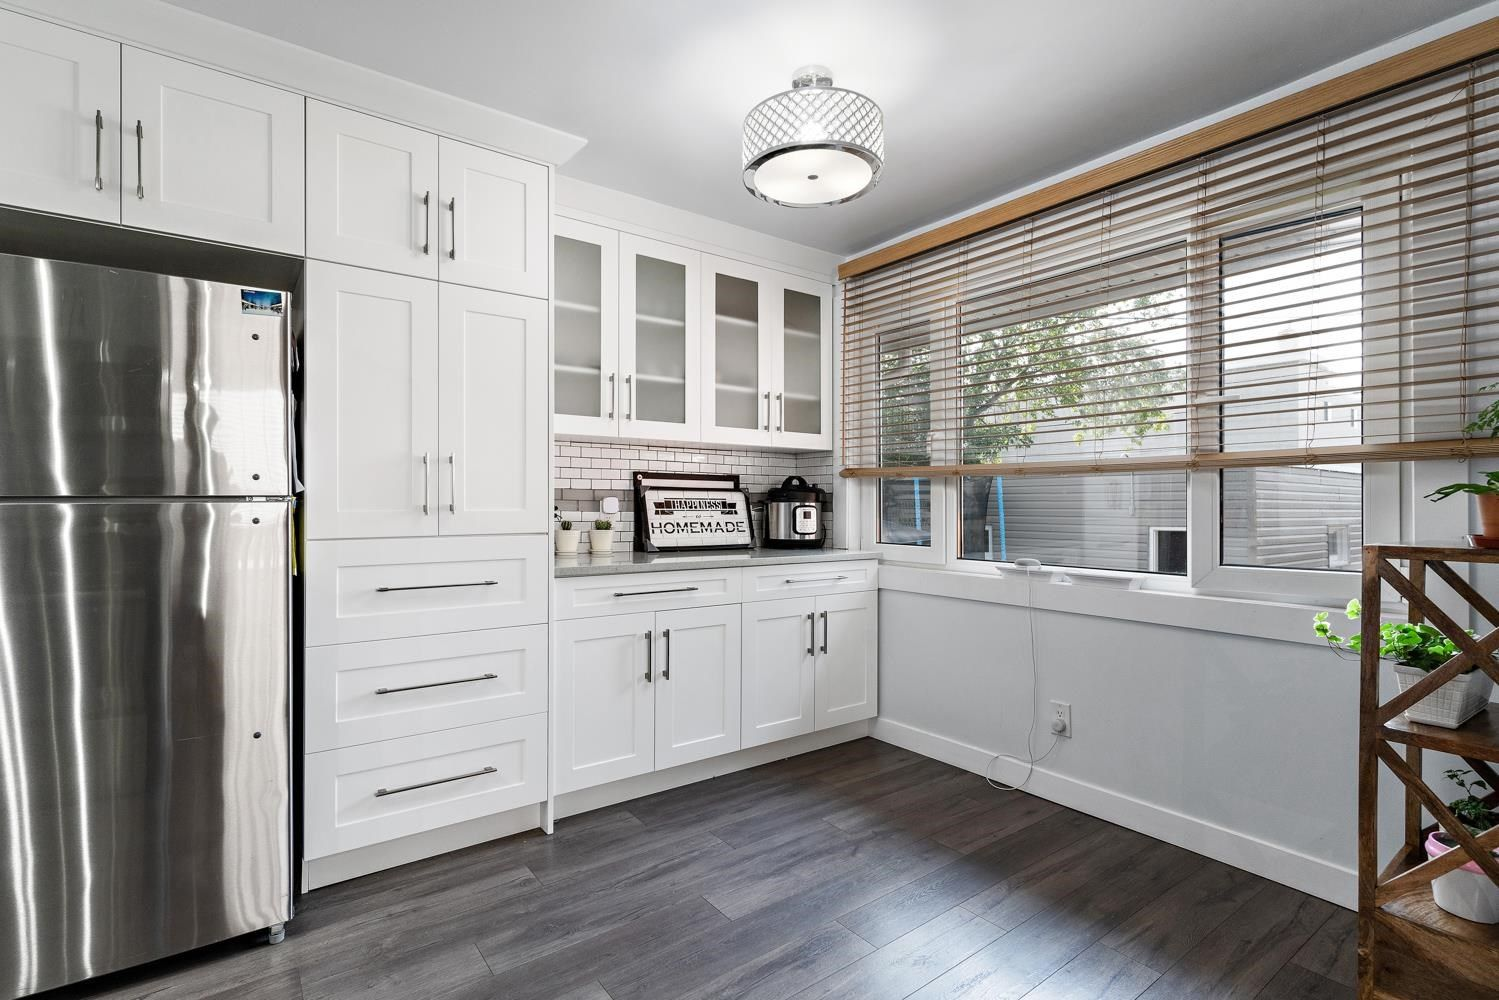 Main Photo: 11311 111A Avenue in Edmonton: Zone 08 House for sale : MLS®# E4257063